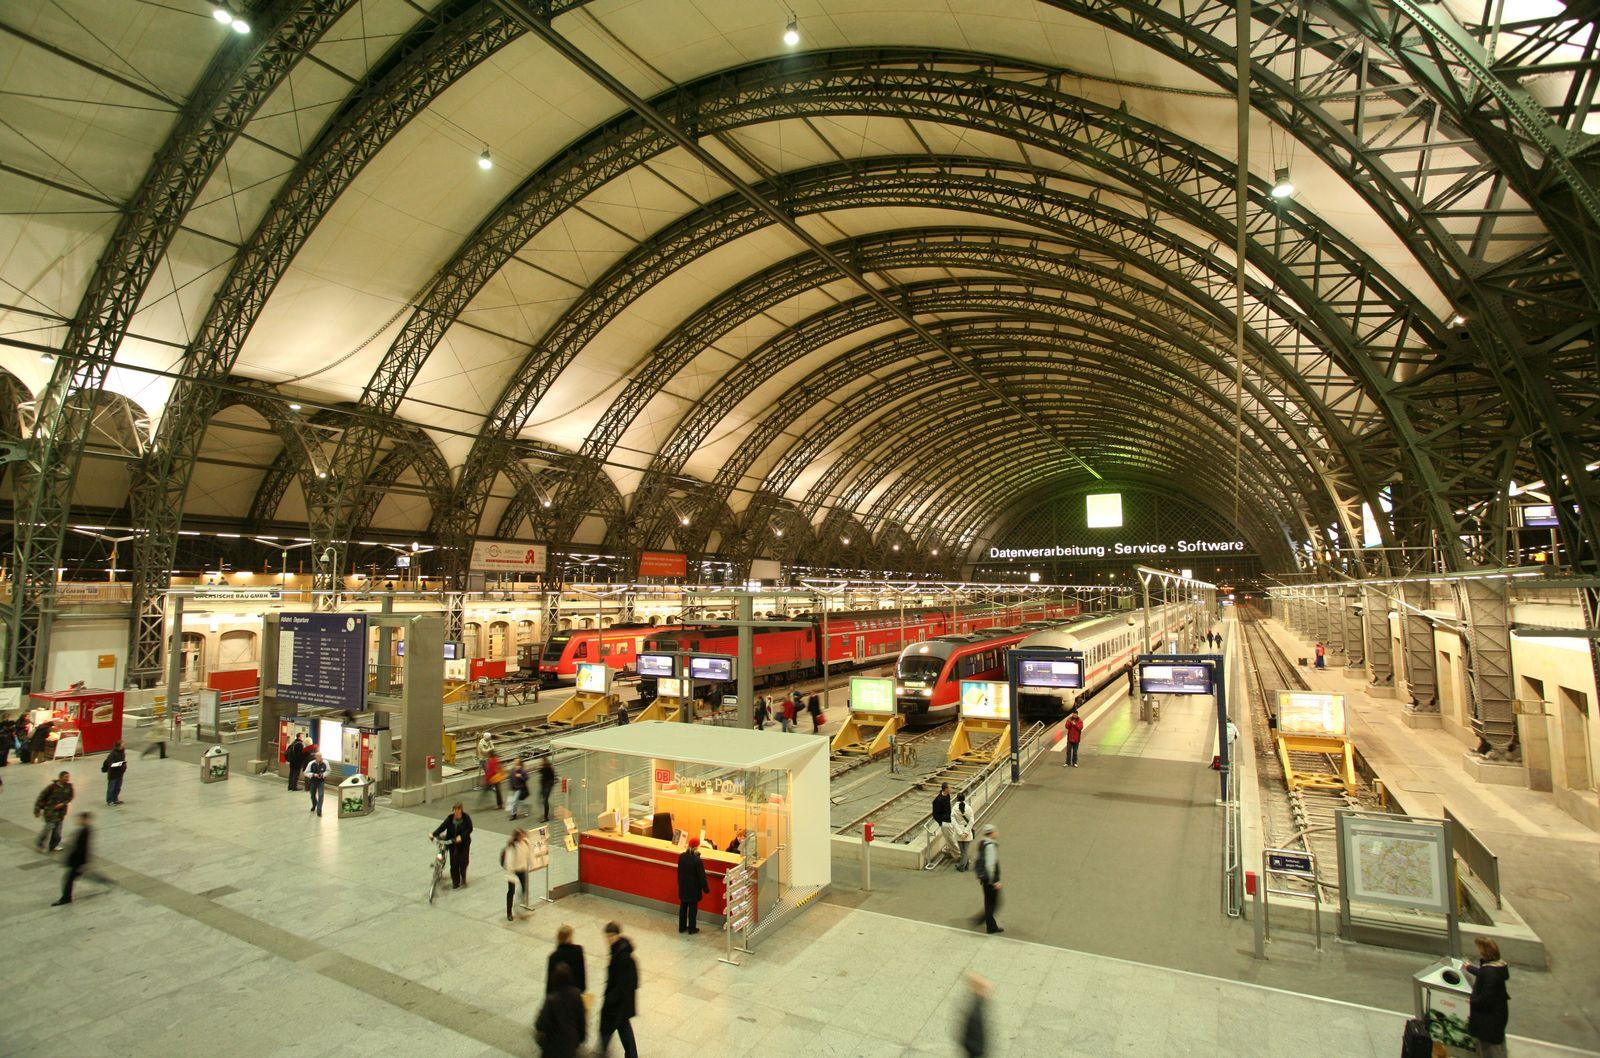 Bahnhof Dresden